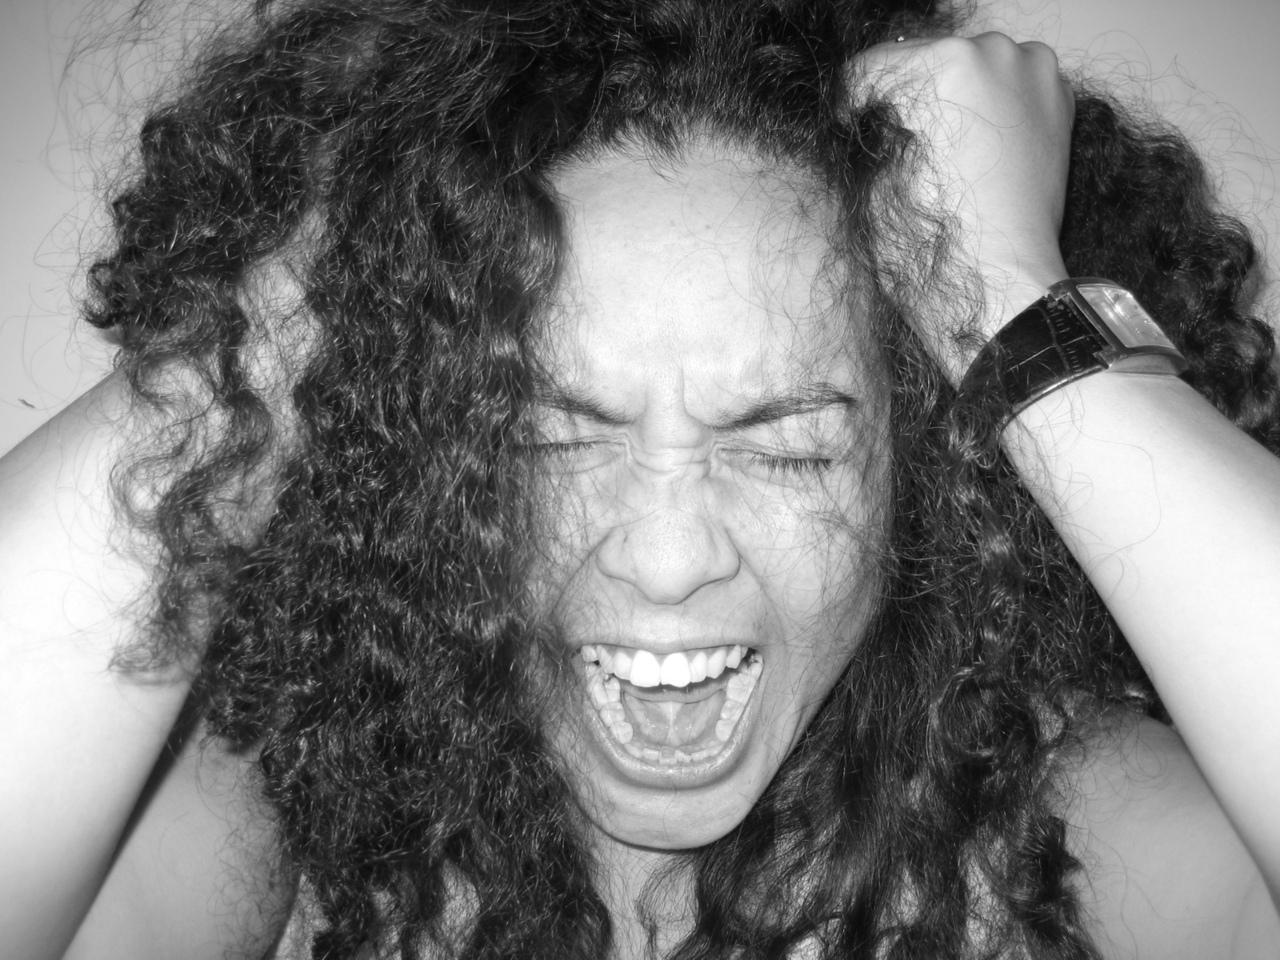 Screaming Mum Pulling Hair